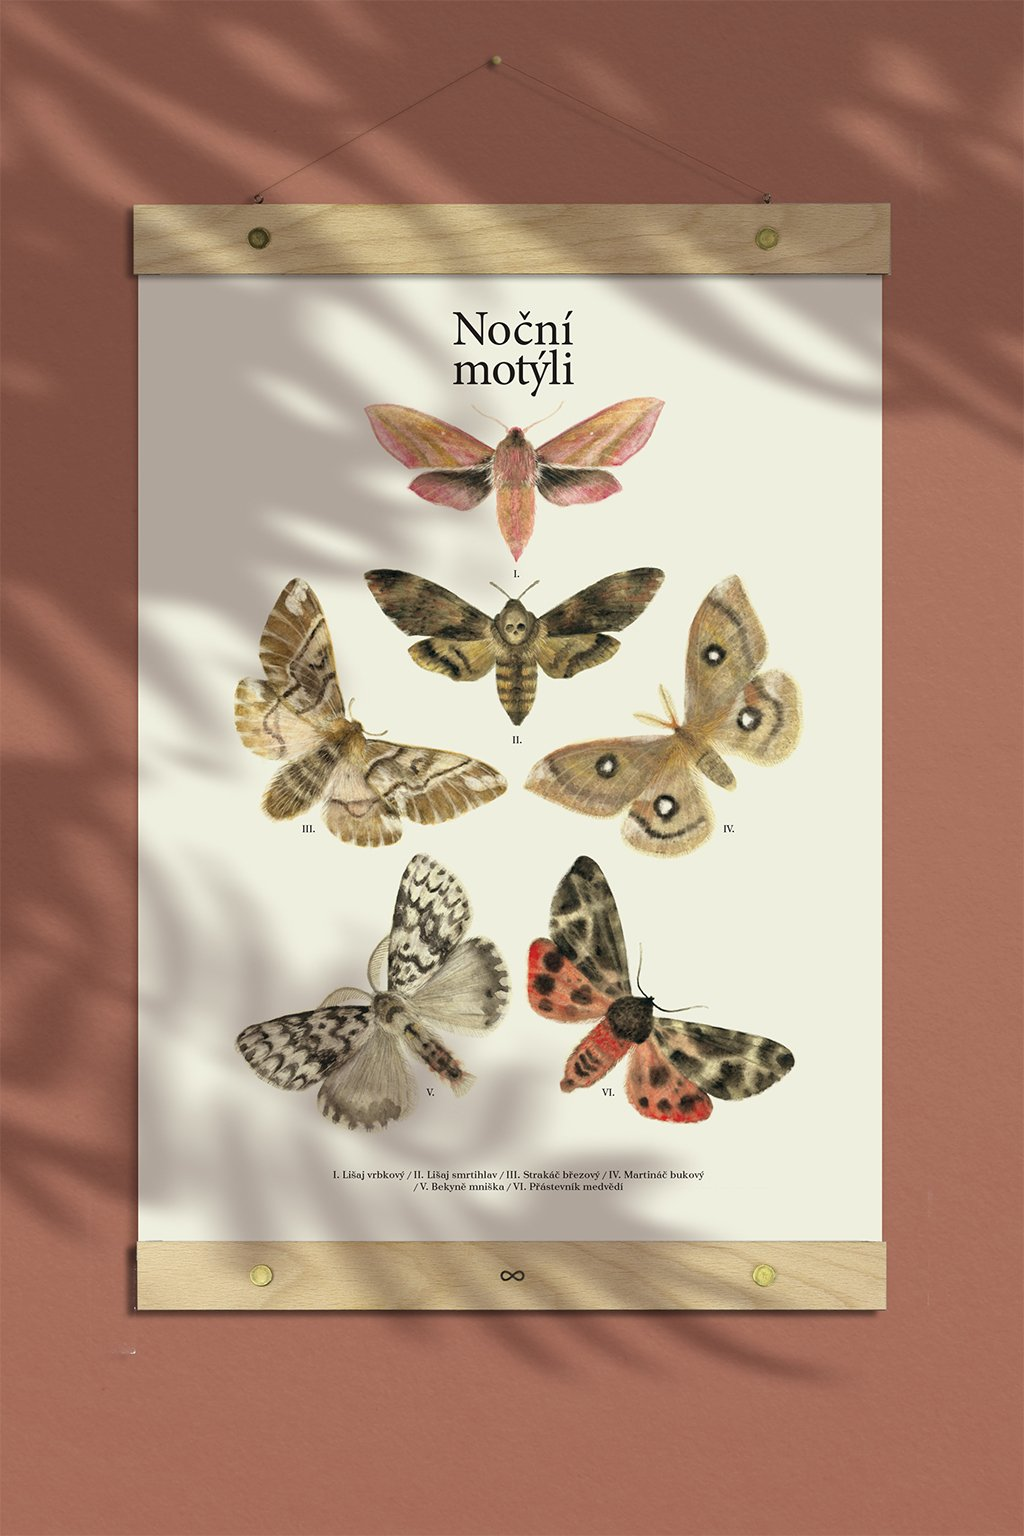 JAATY_autorsky-plakat-nocni-motyli-mury